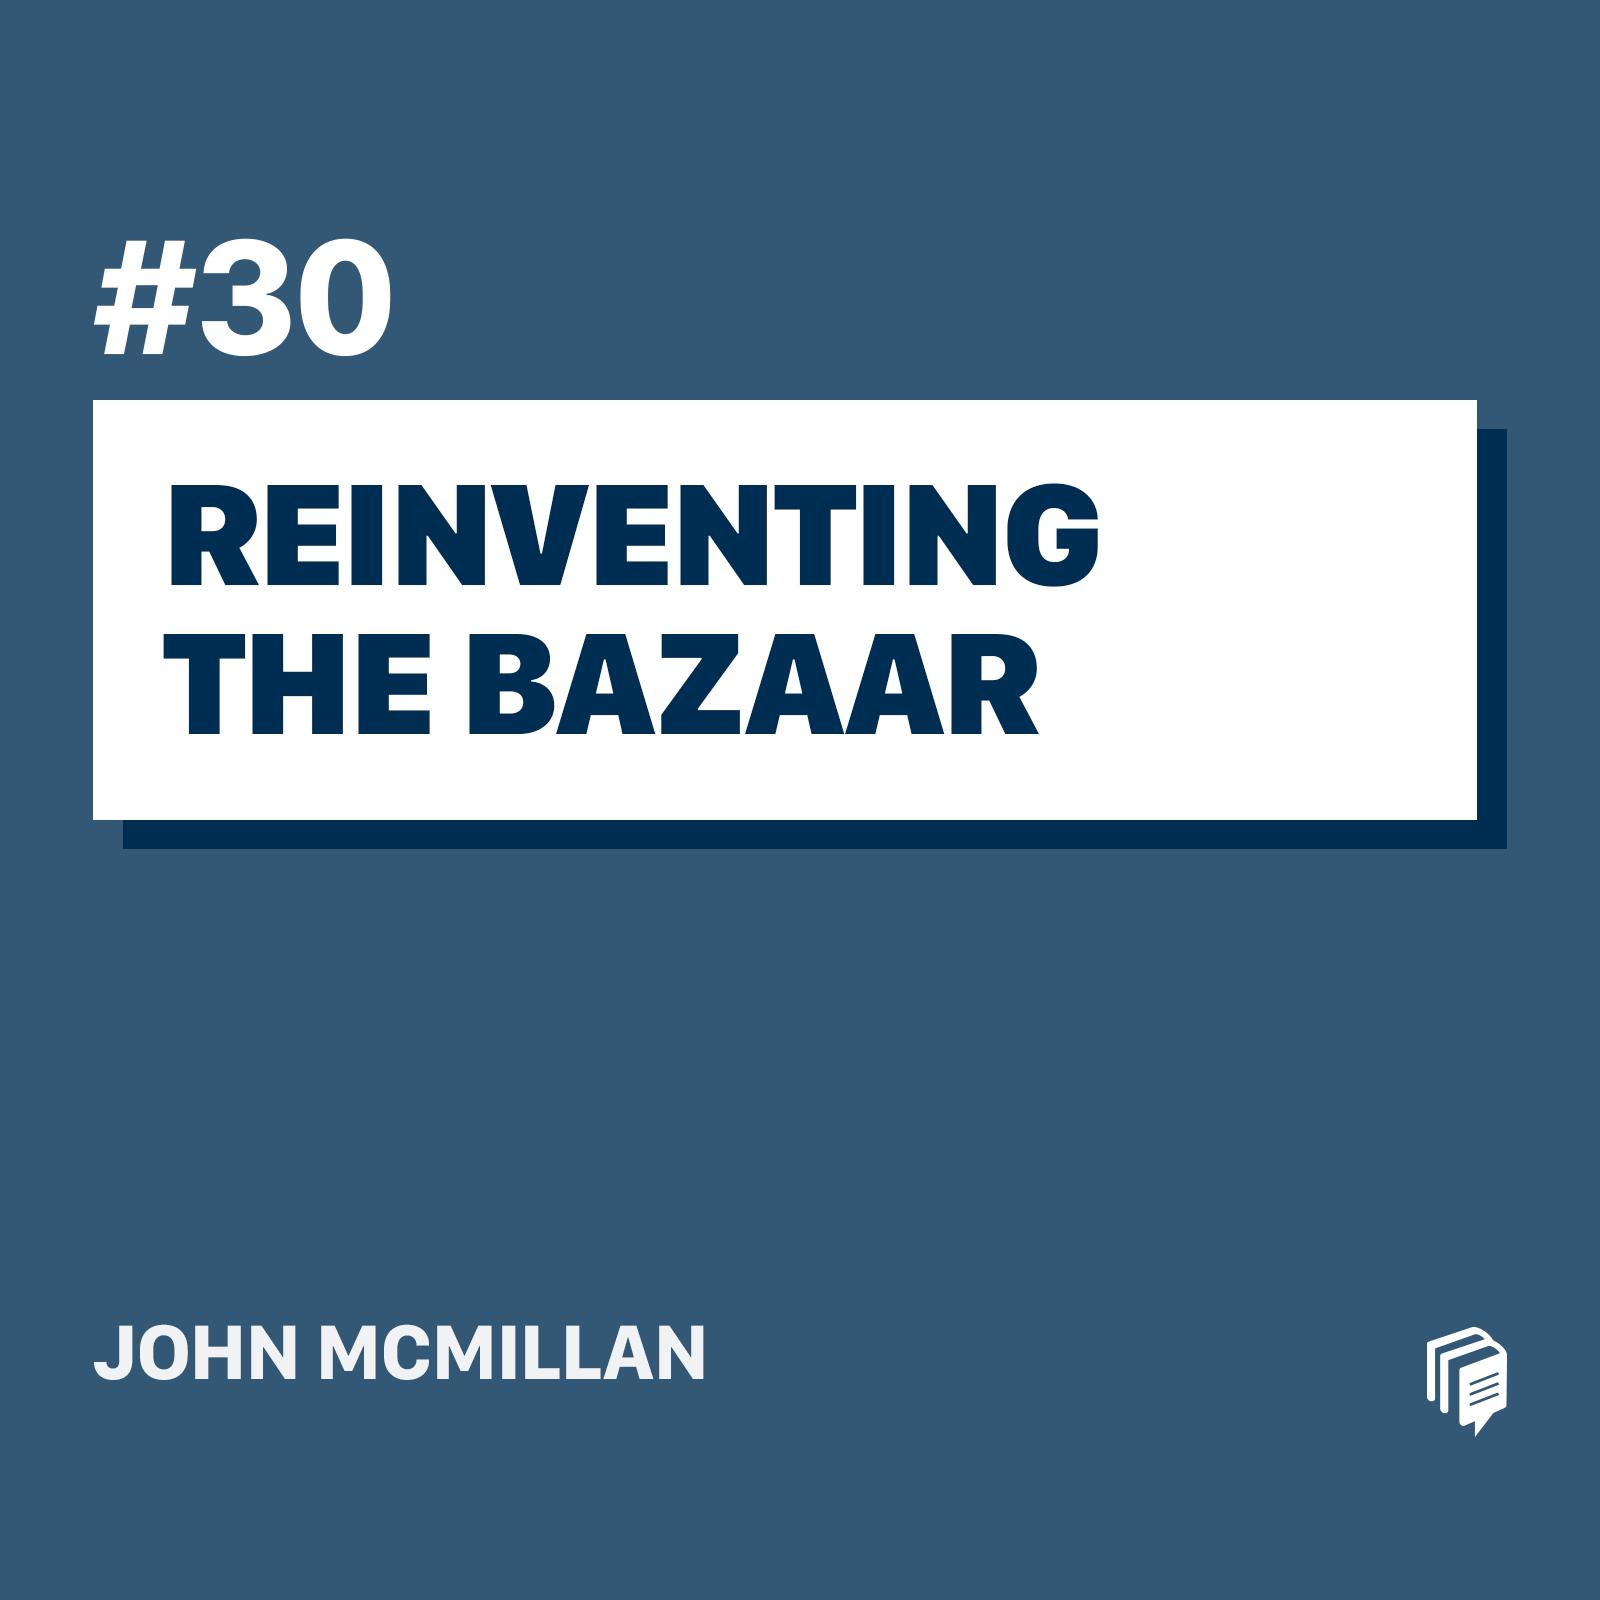 30: Reinventing The Bazaar (خلاصهی کتاب بازآفرینی بازار)